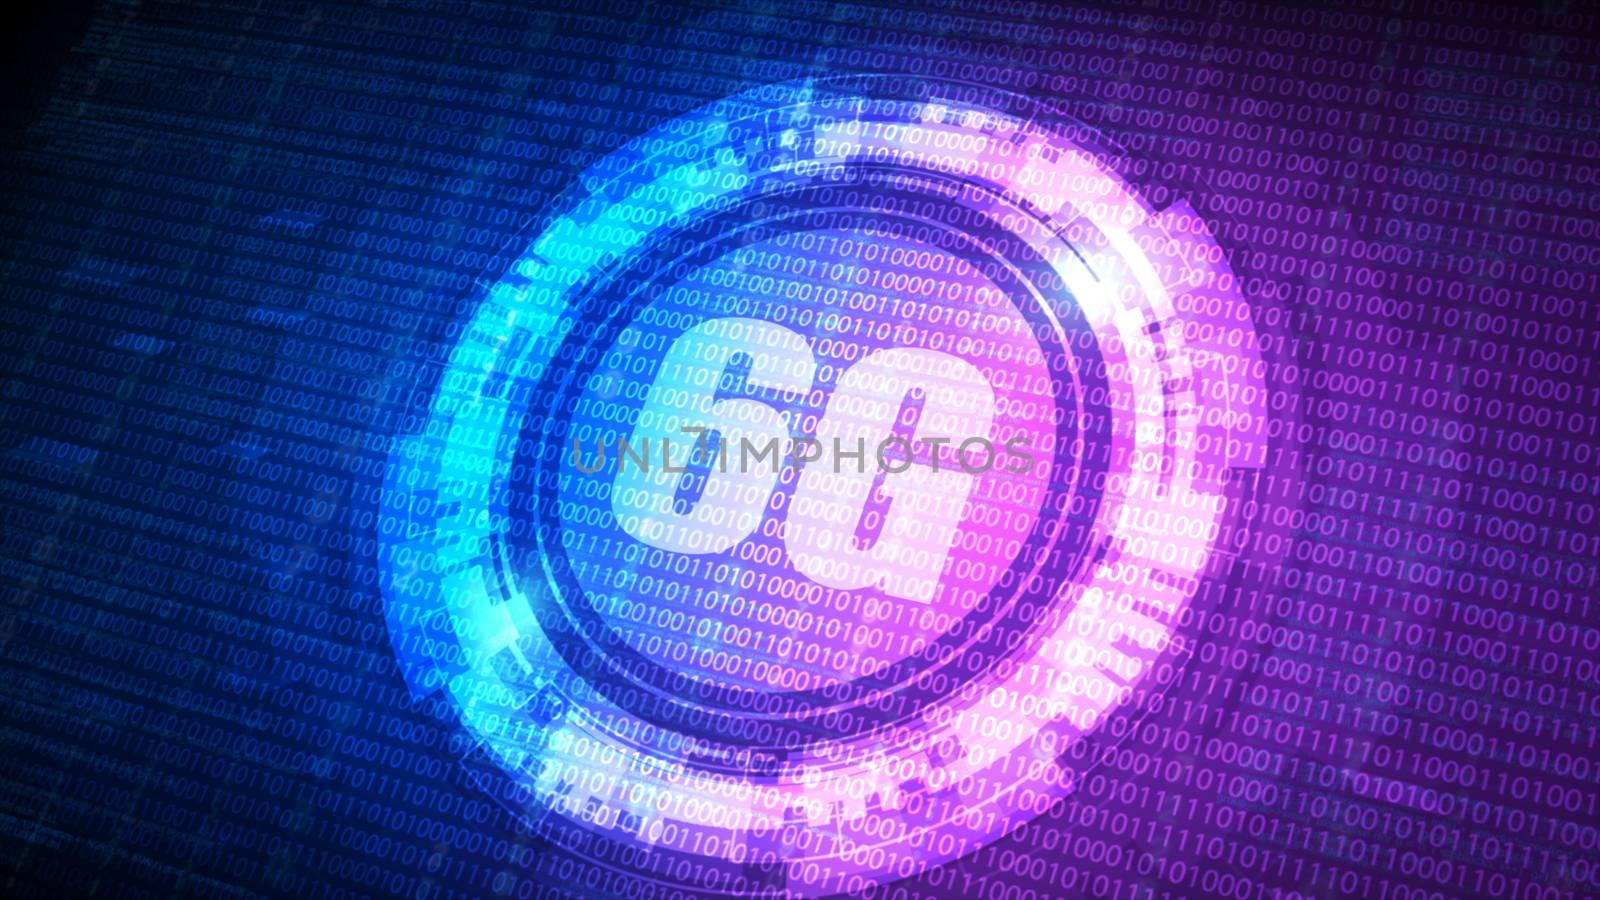 6G network, wireless technology